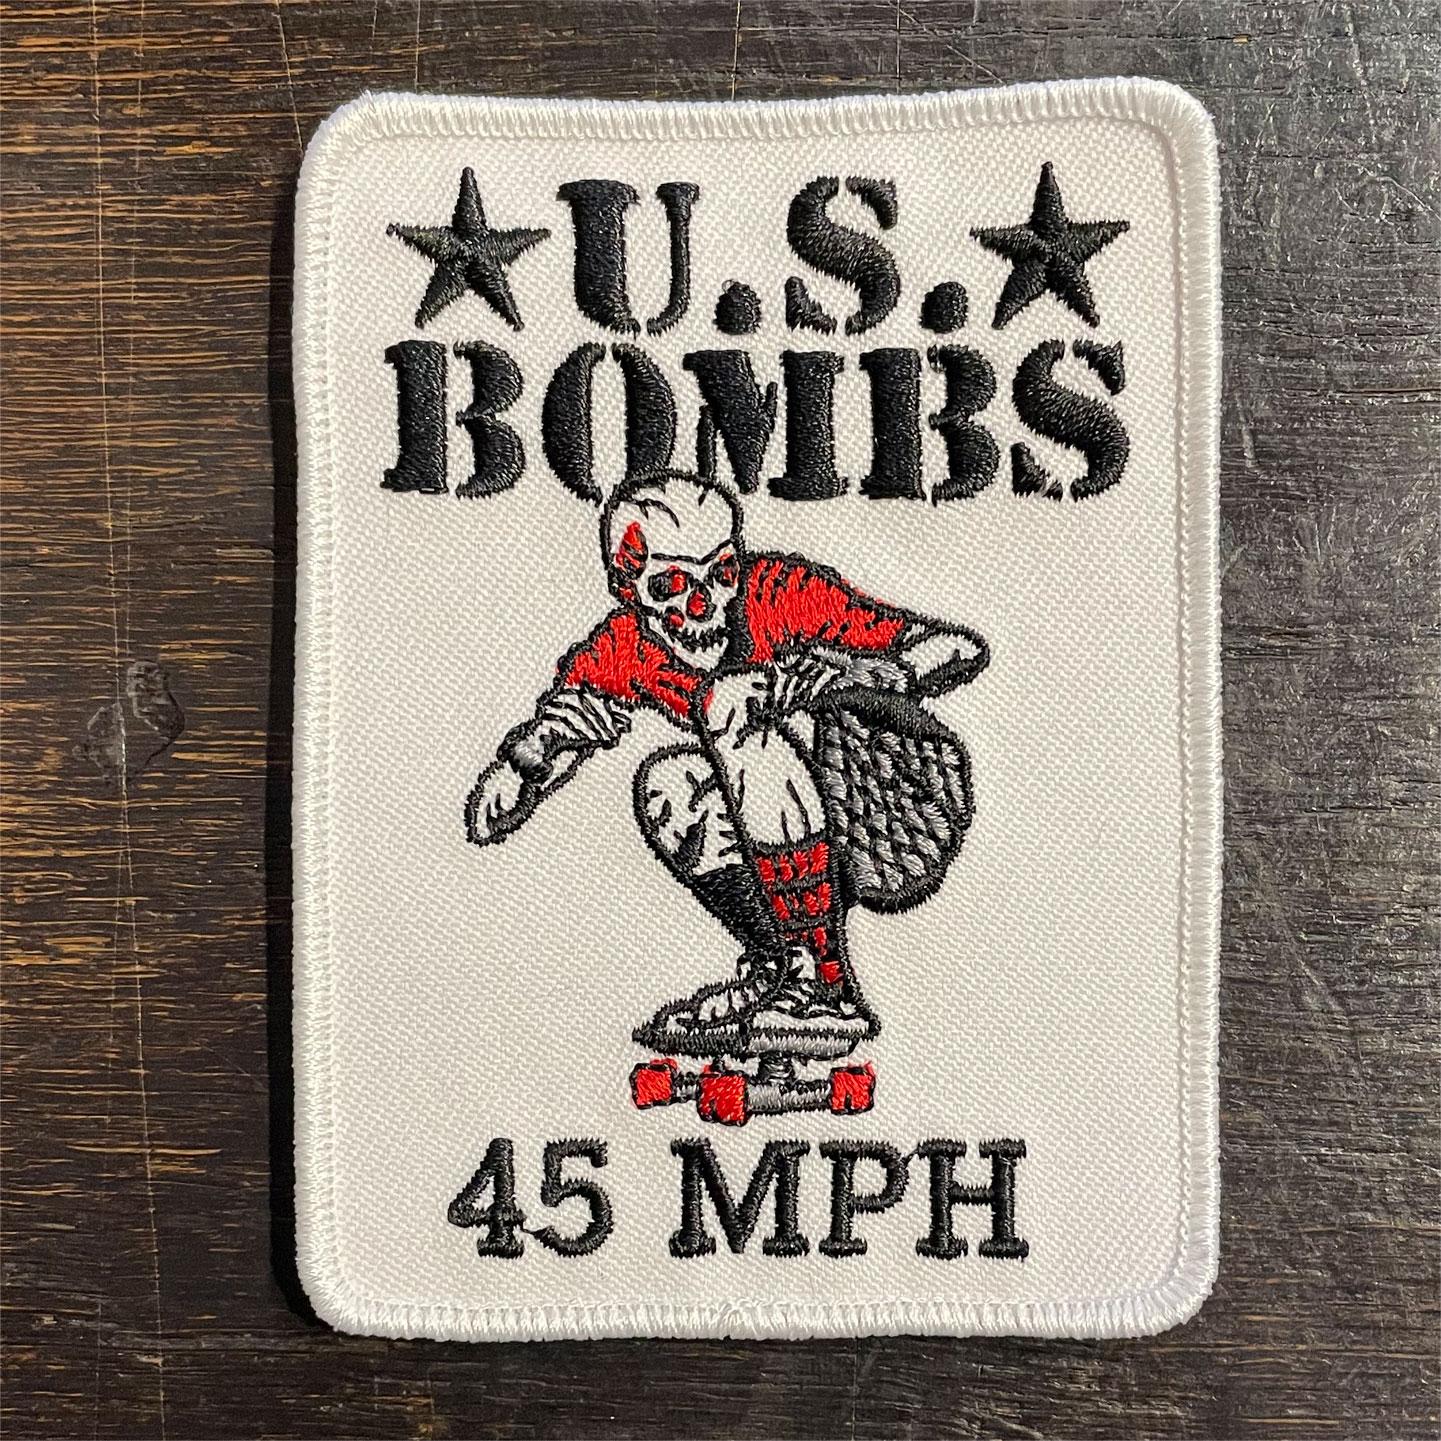 US BOMB 刺繍ワッペン 45MPH